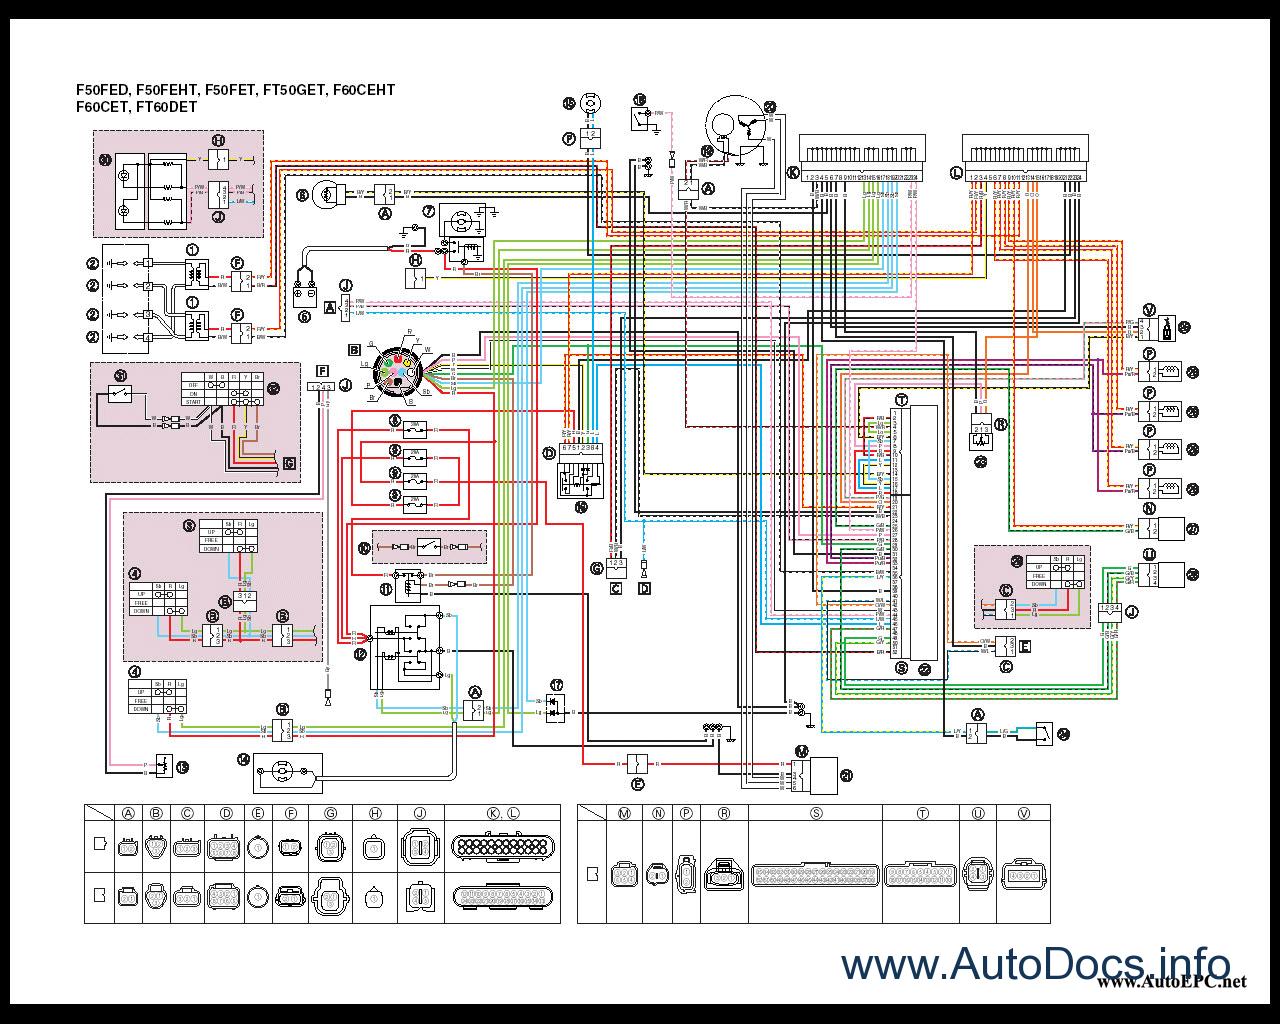 electric circuit diagram pressebank de  saturn sky fuse box diagram on saturn  sky fuse box diagramez go golf cart wiring diagram on ez go gas wiring  diagram